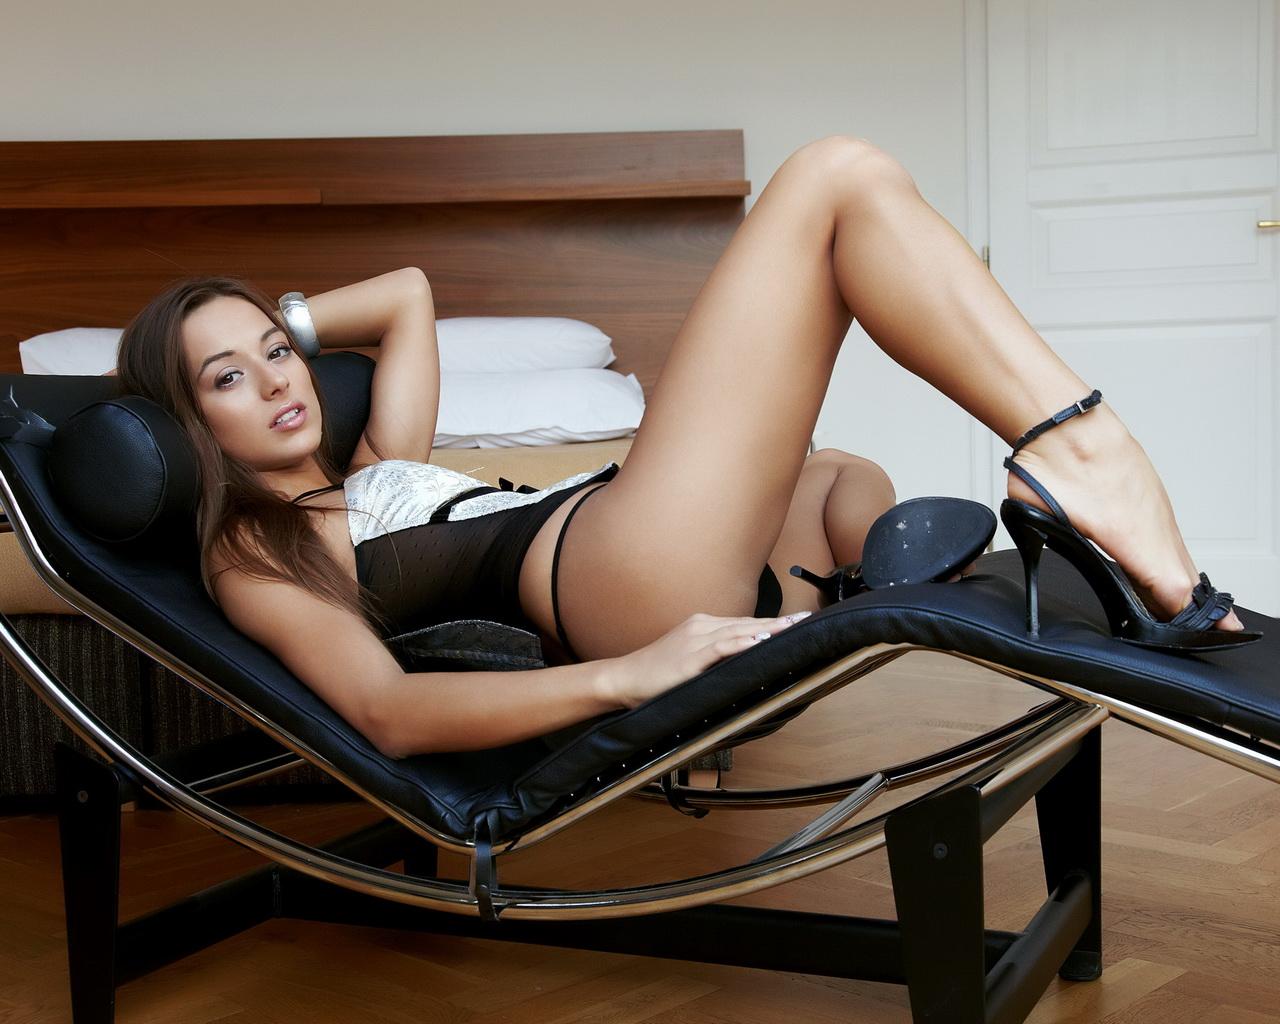 ungdoms hjemme sex katrina bollywood bilder